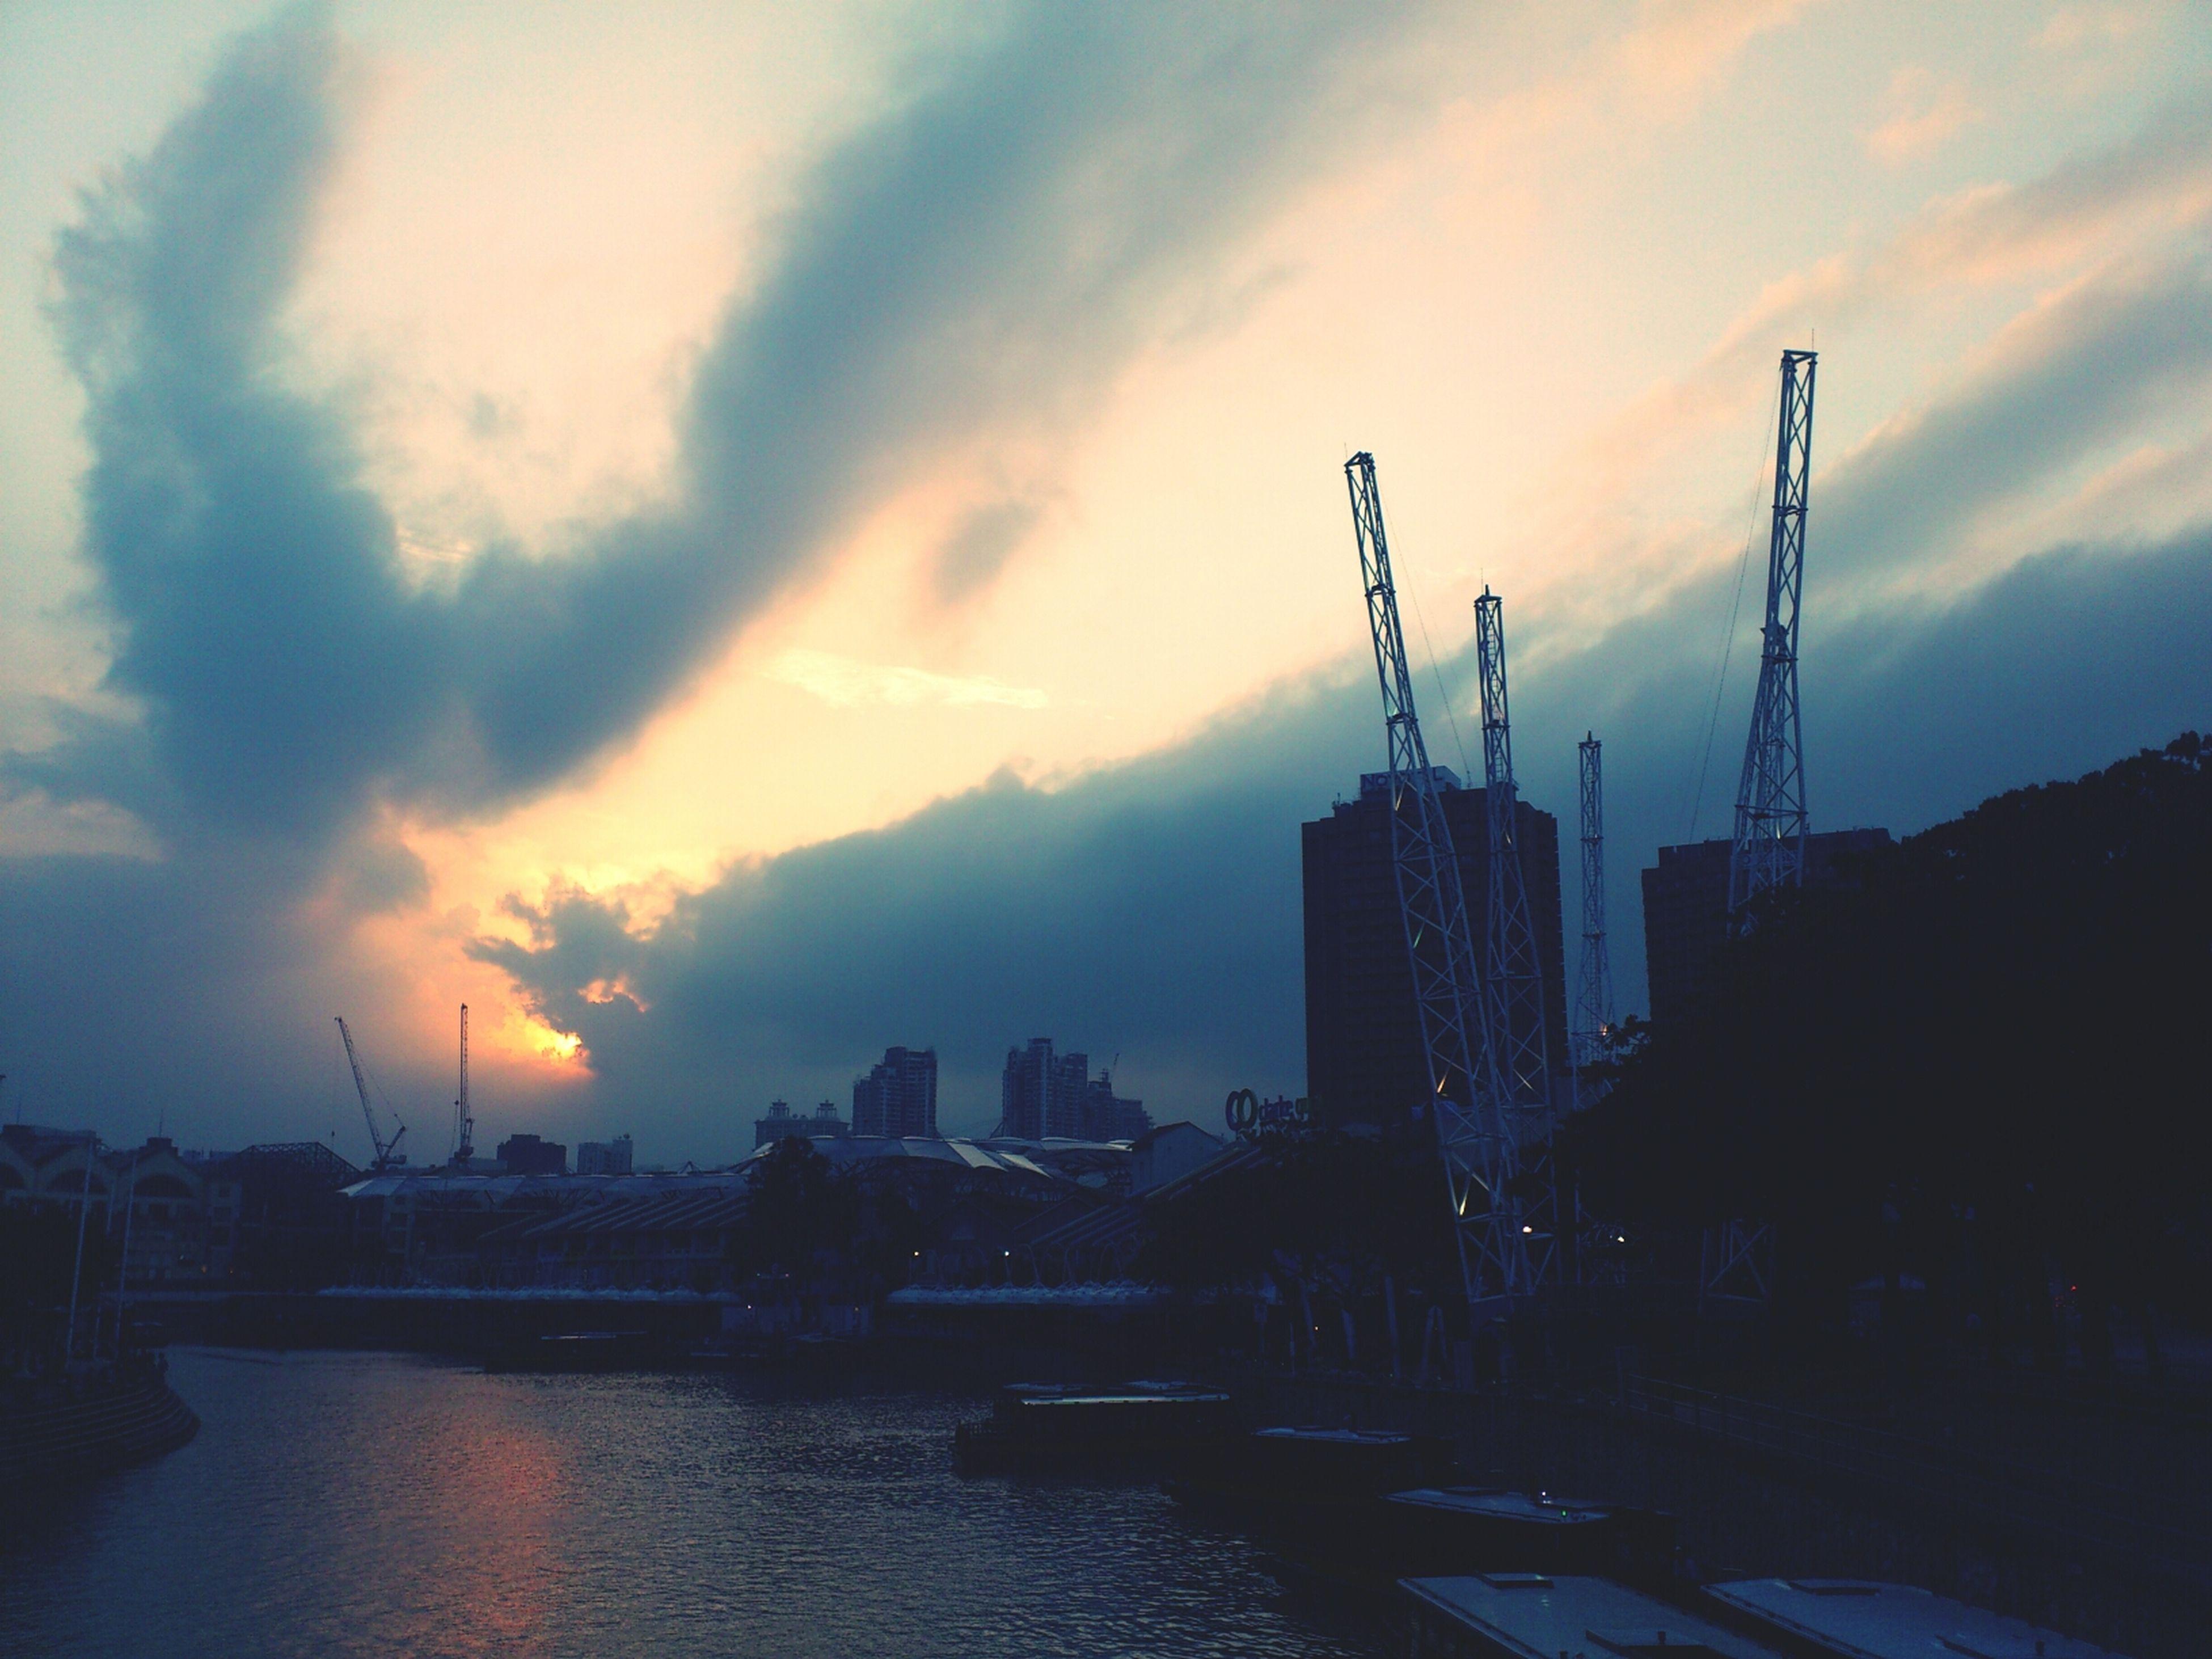 sunset, architecture, building exterior, built structure, sky, cloud - sky, city, water, crane - construction machinery, orange color, river, waterfront, cloudy, silhouette, cityscape, cloud, industry, development, outdoors, no people